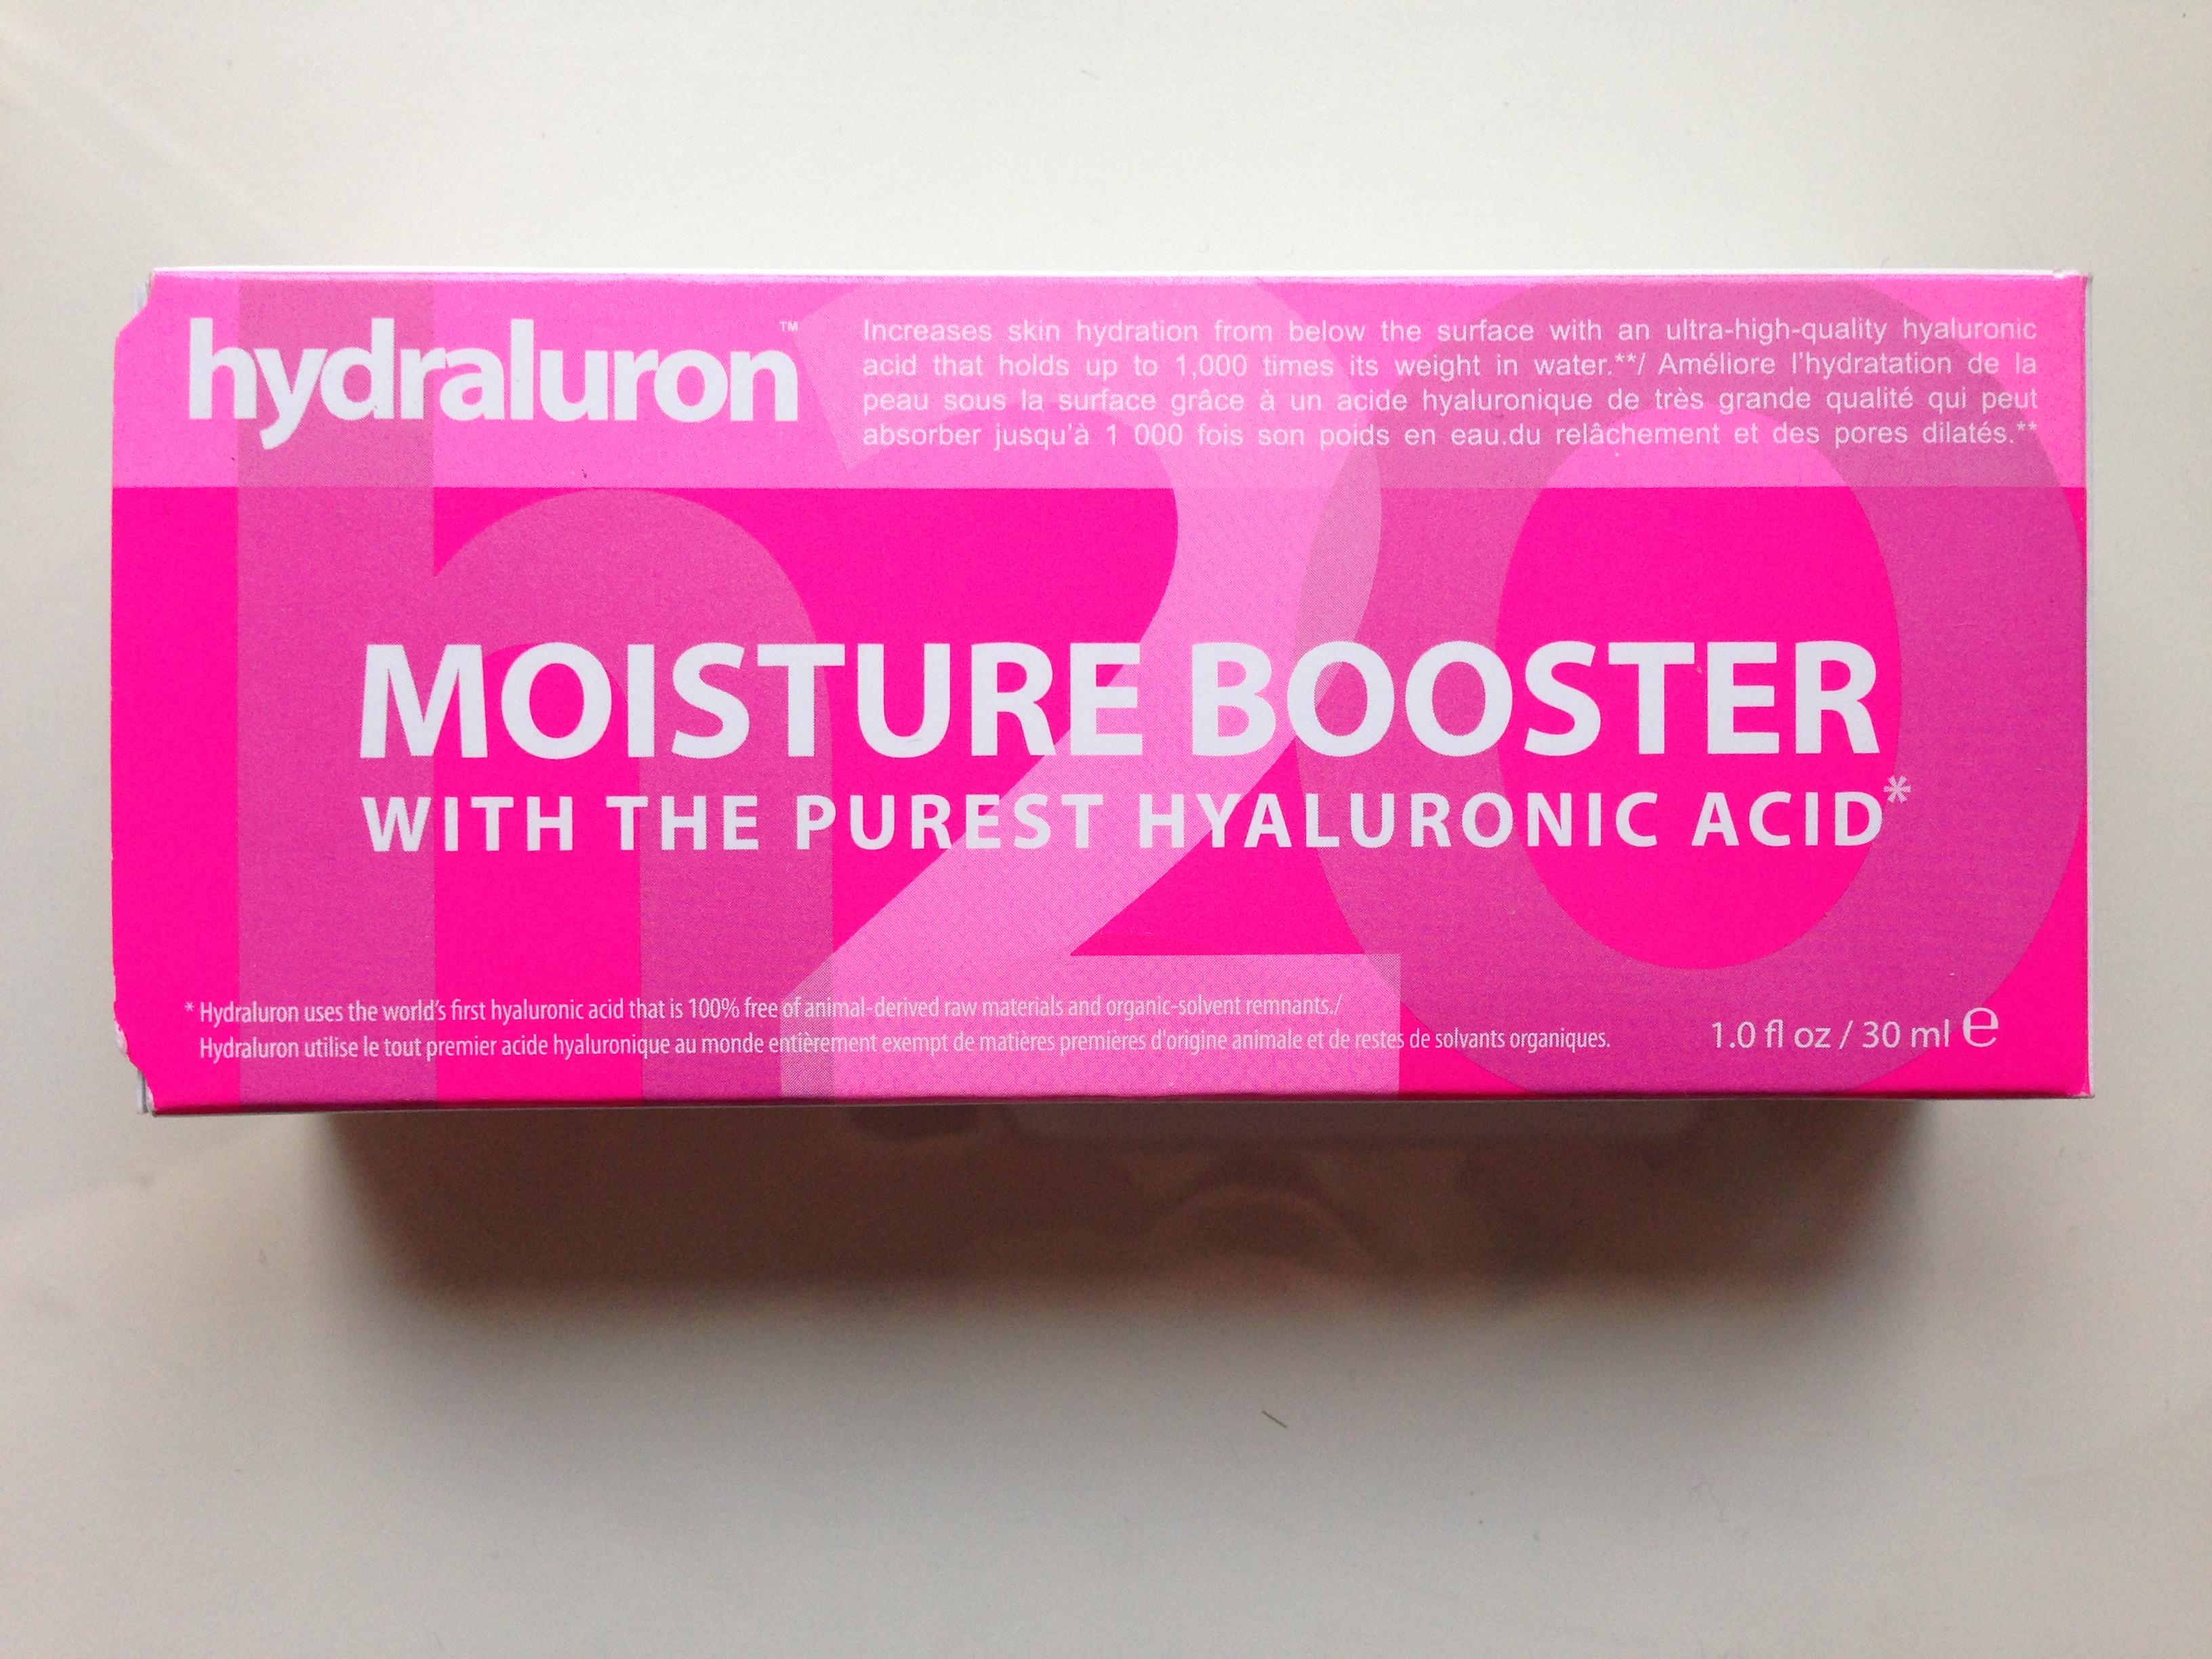 Hydraluron Moisture Booster